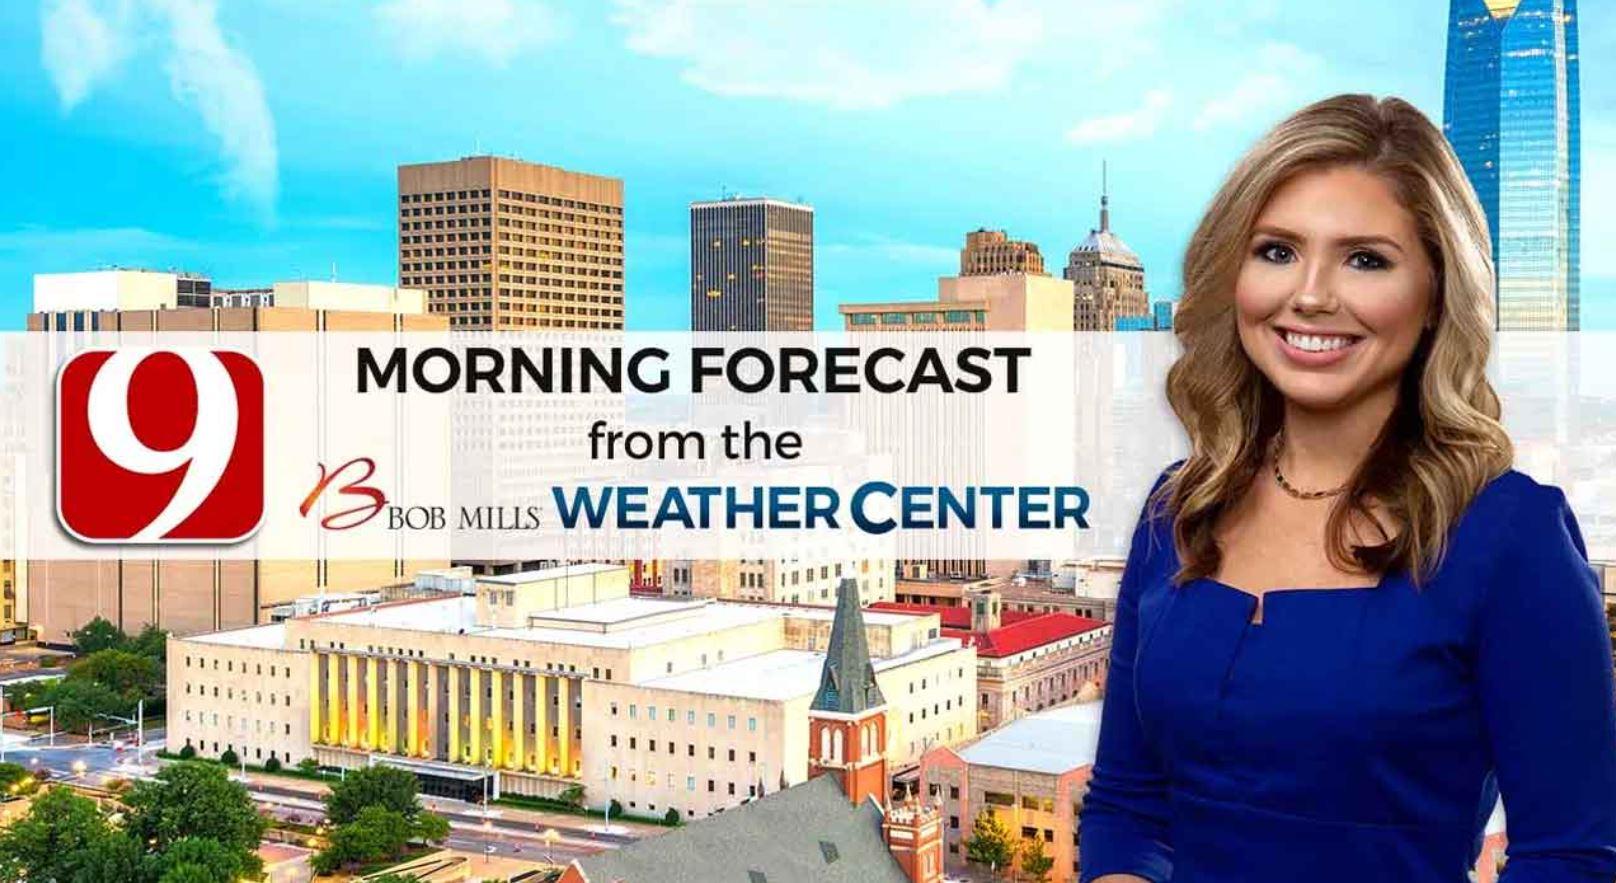 Cassie's 9 a.m. Friday Forecast